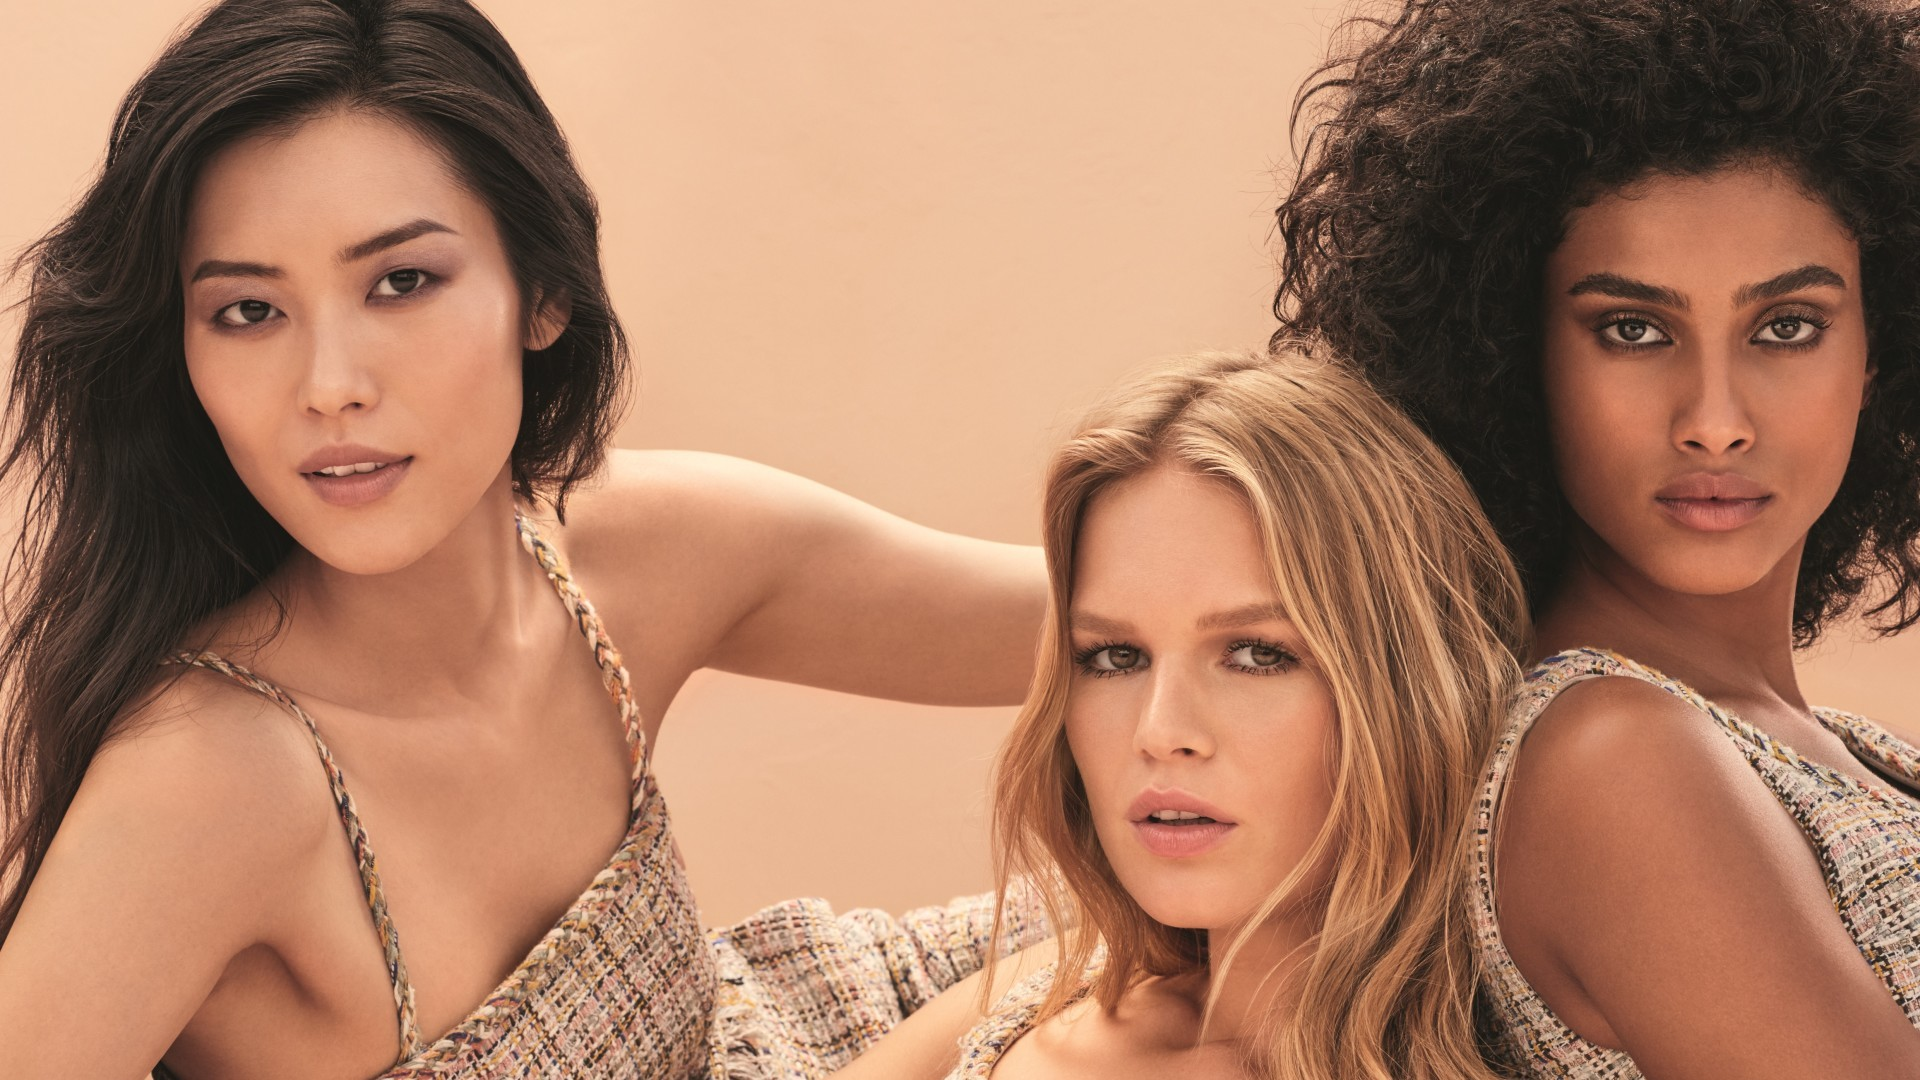 Chanel Les Beiges: Za žene koje žele zdrav i prirodan sjaj kože